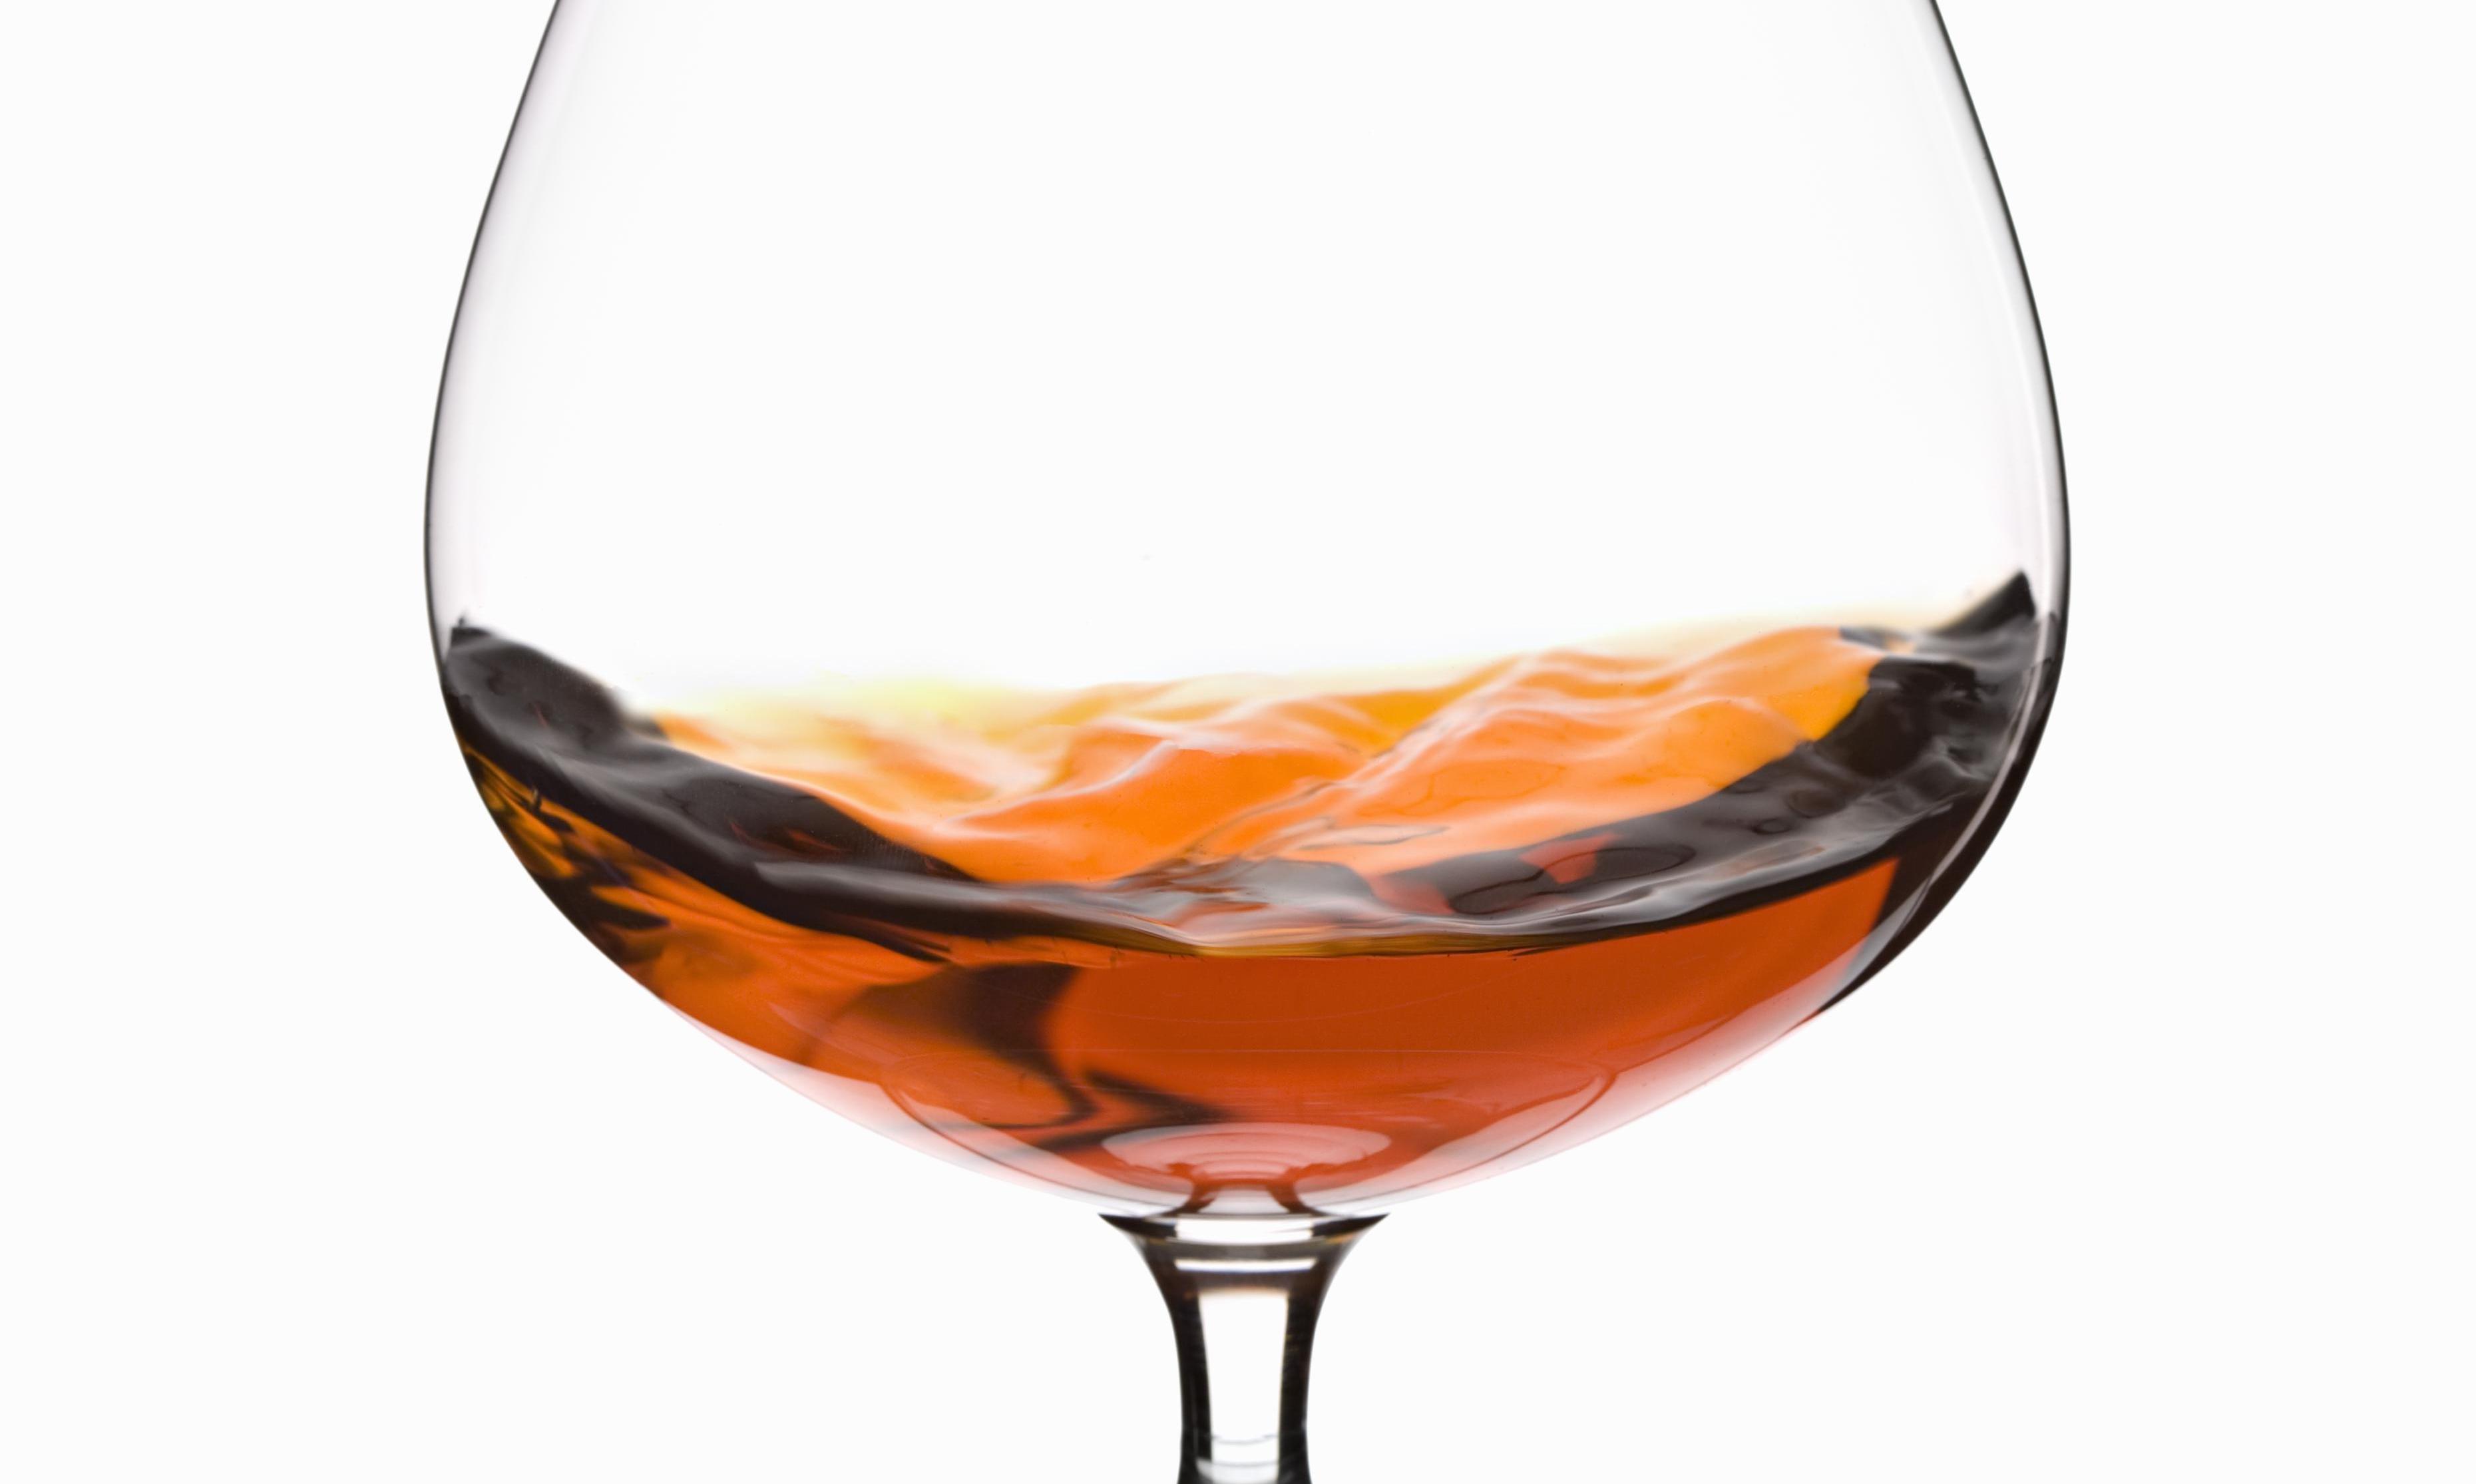 Glass of Brandy (Cognac)